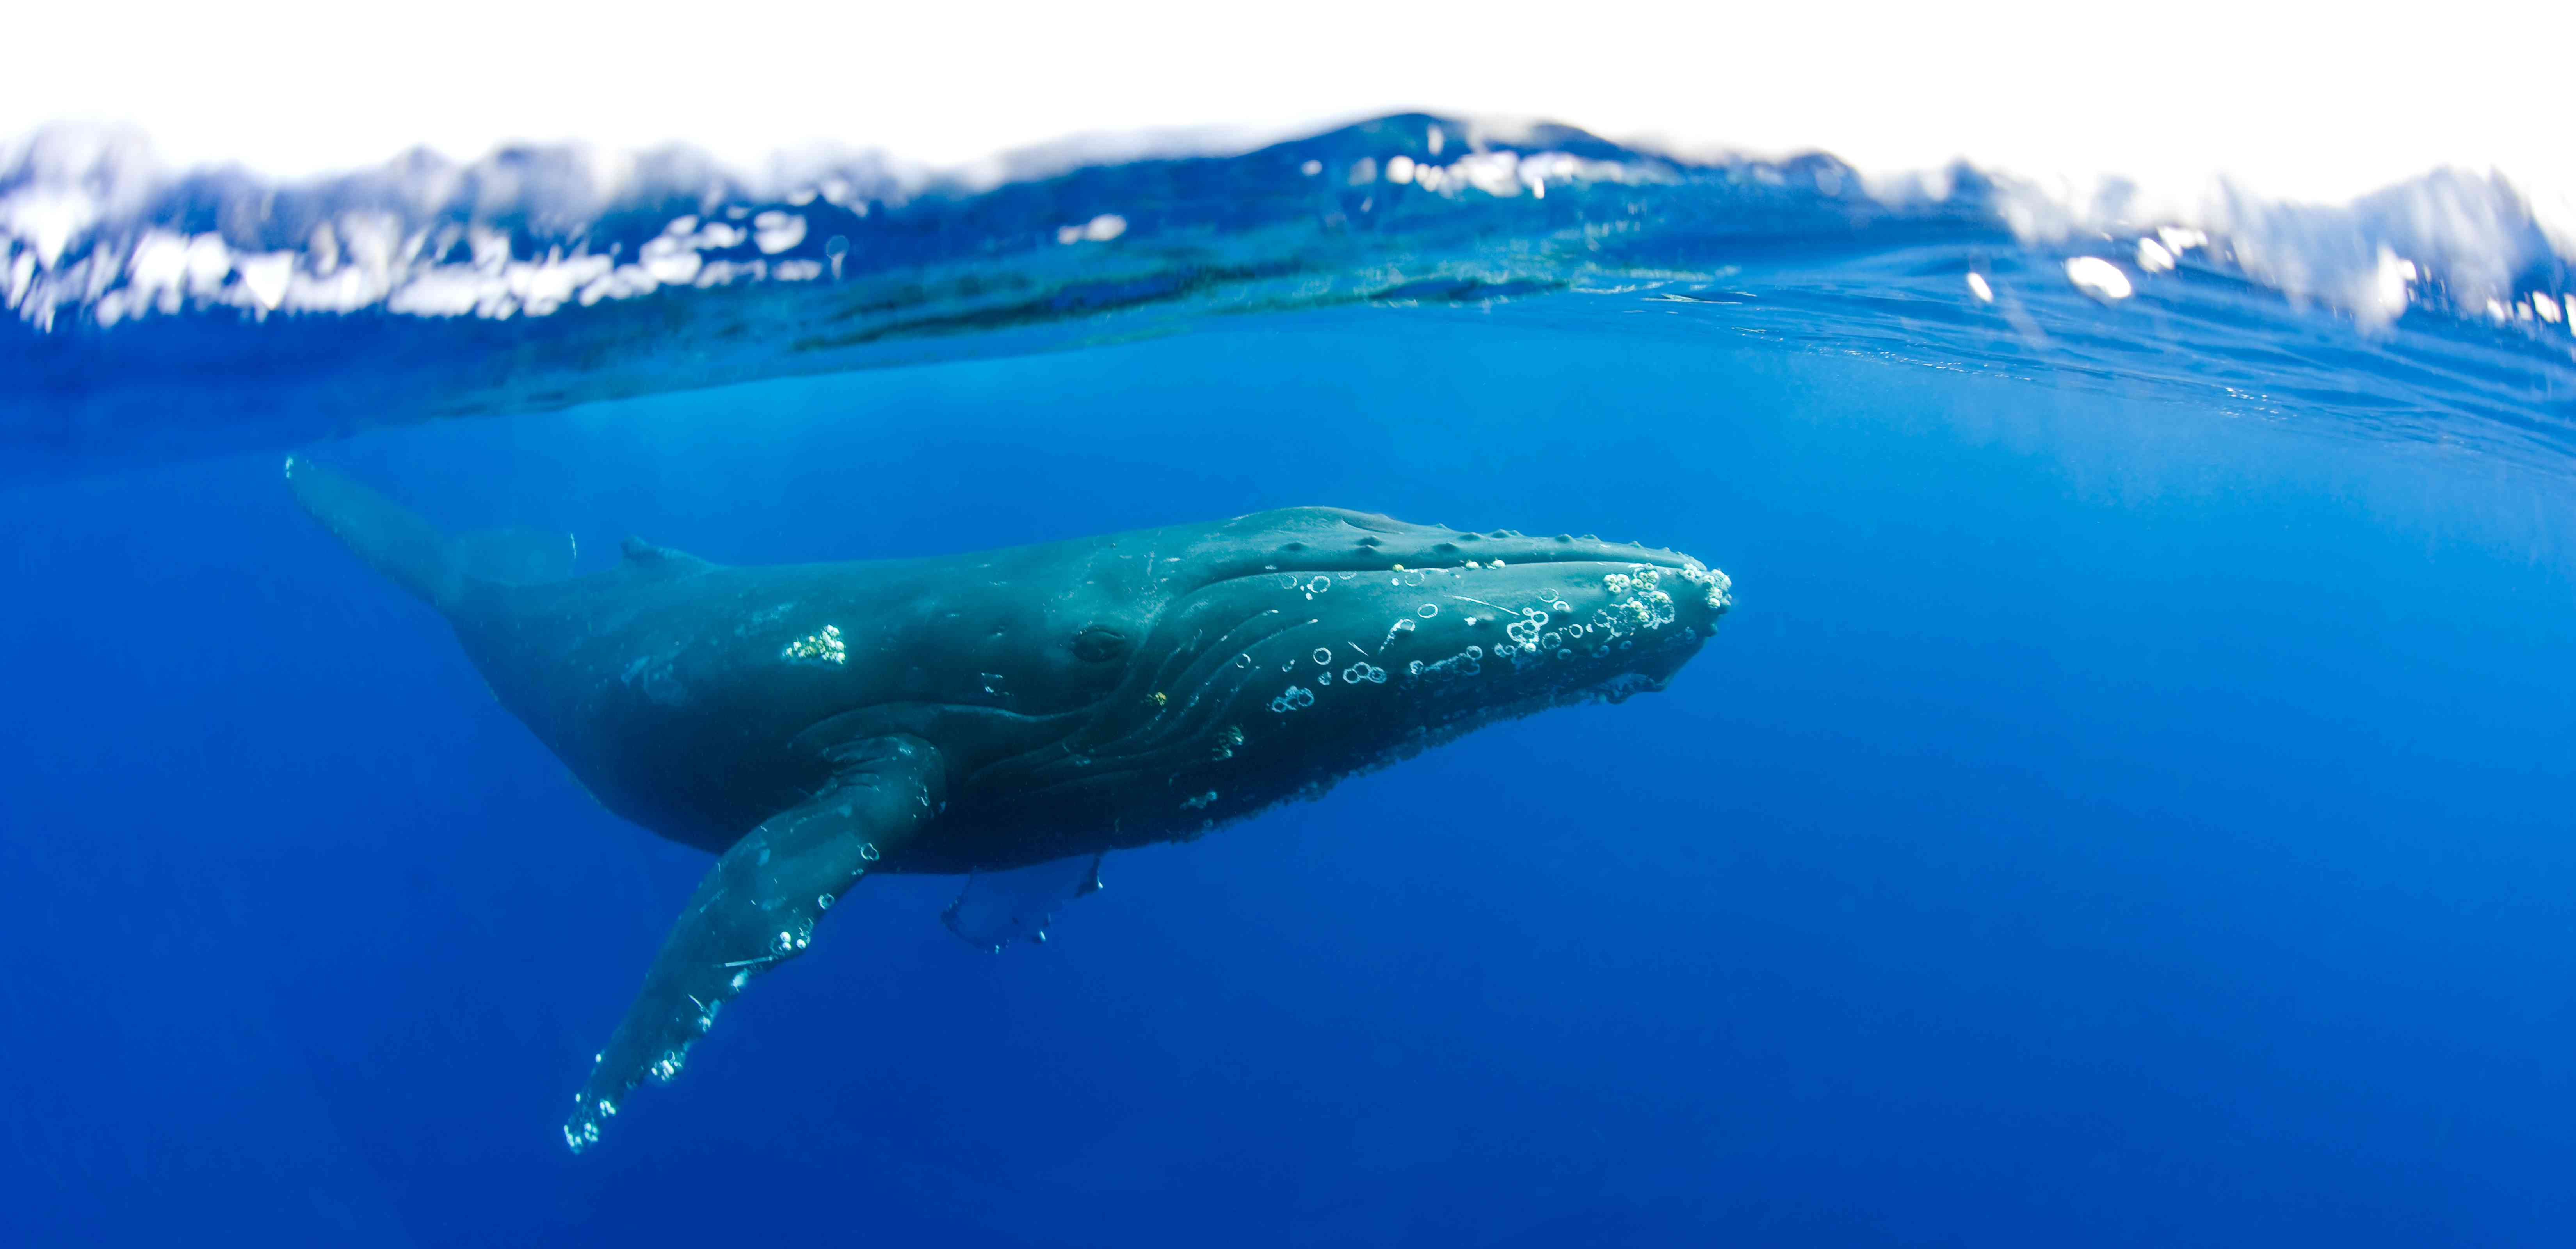 Humpback whale in Maui